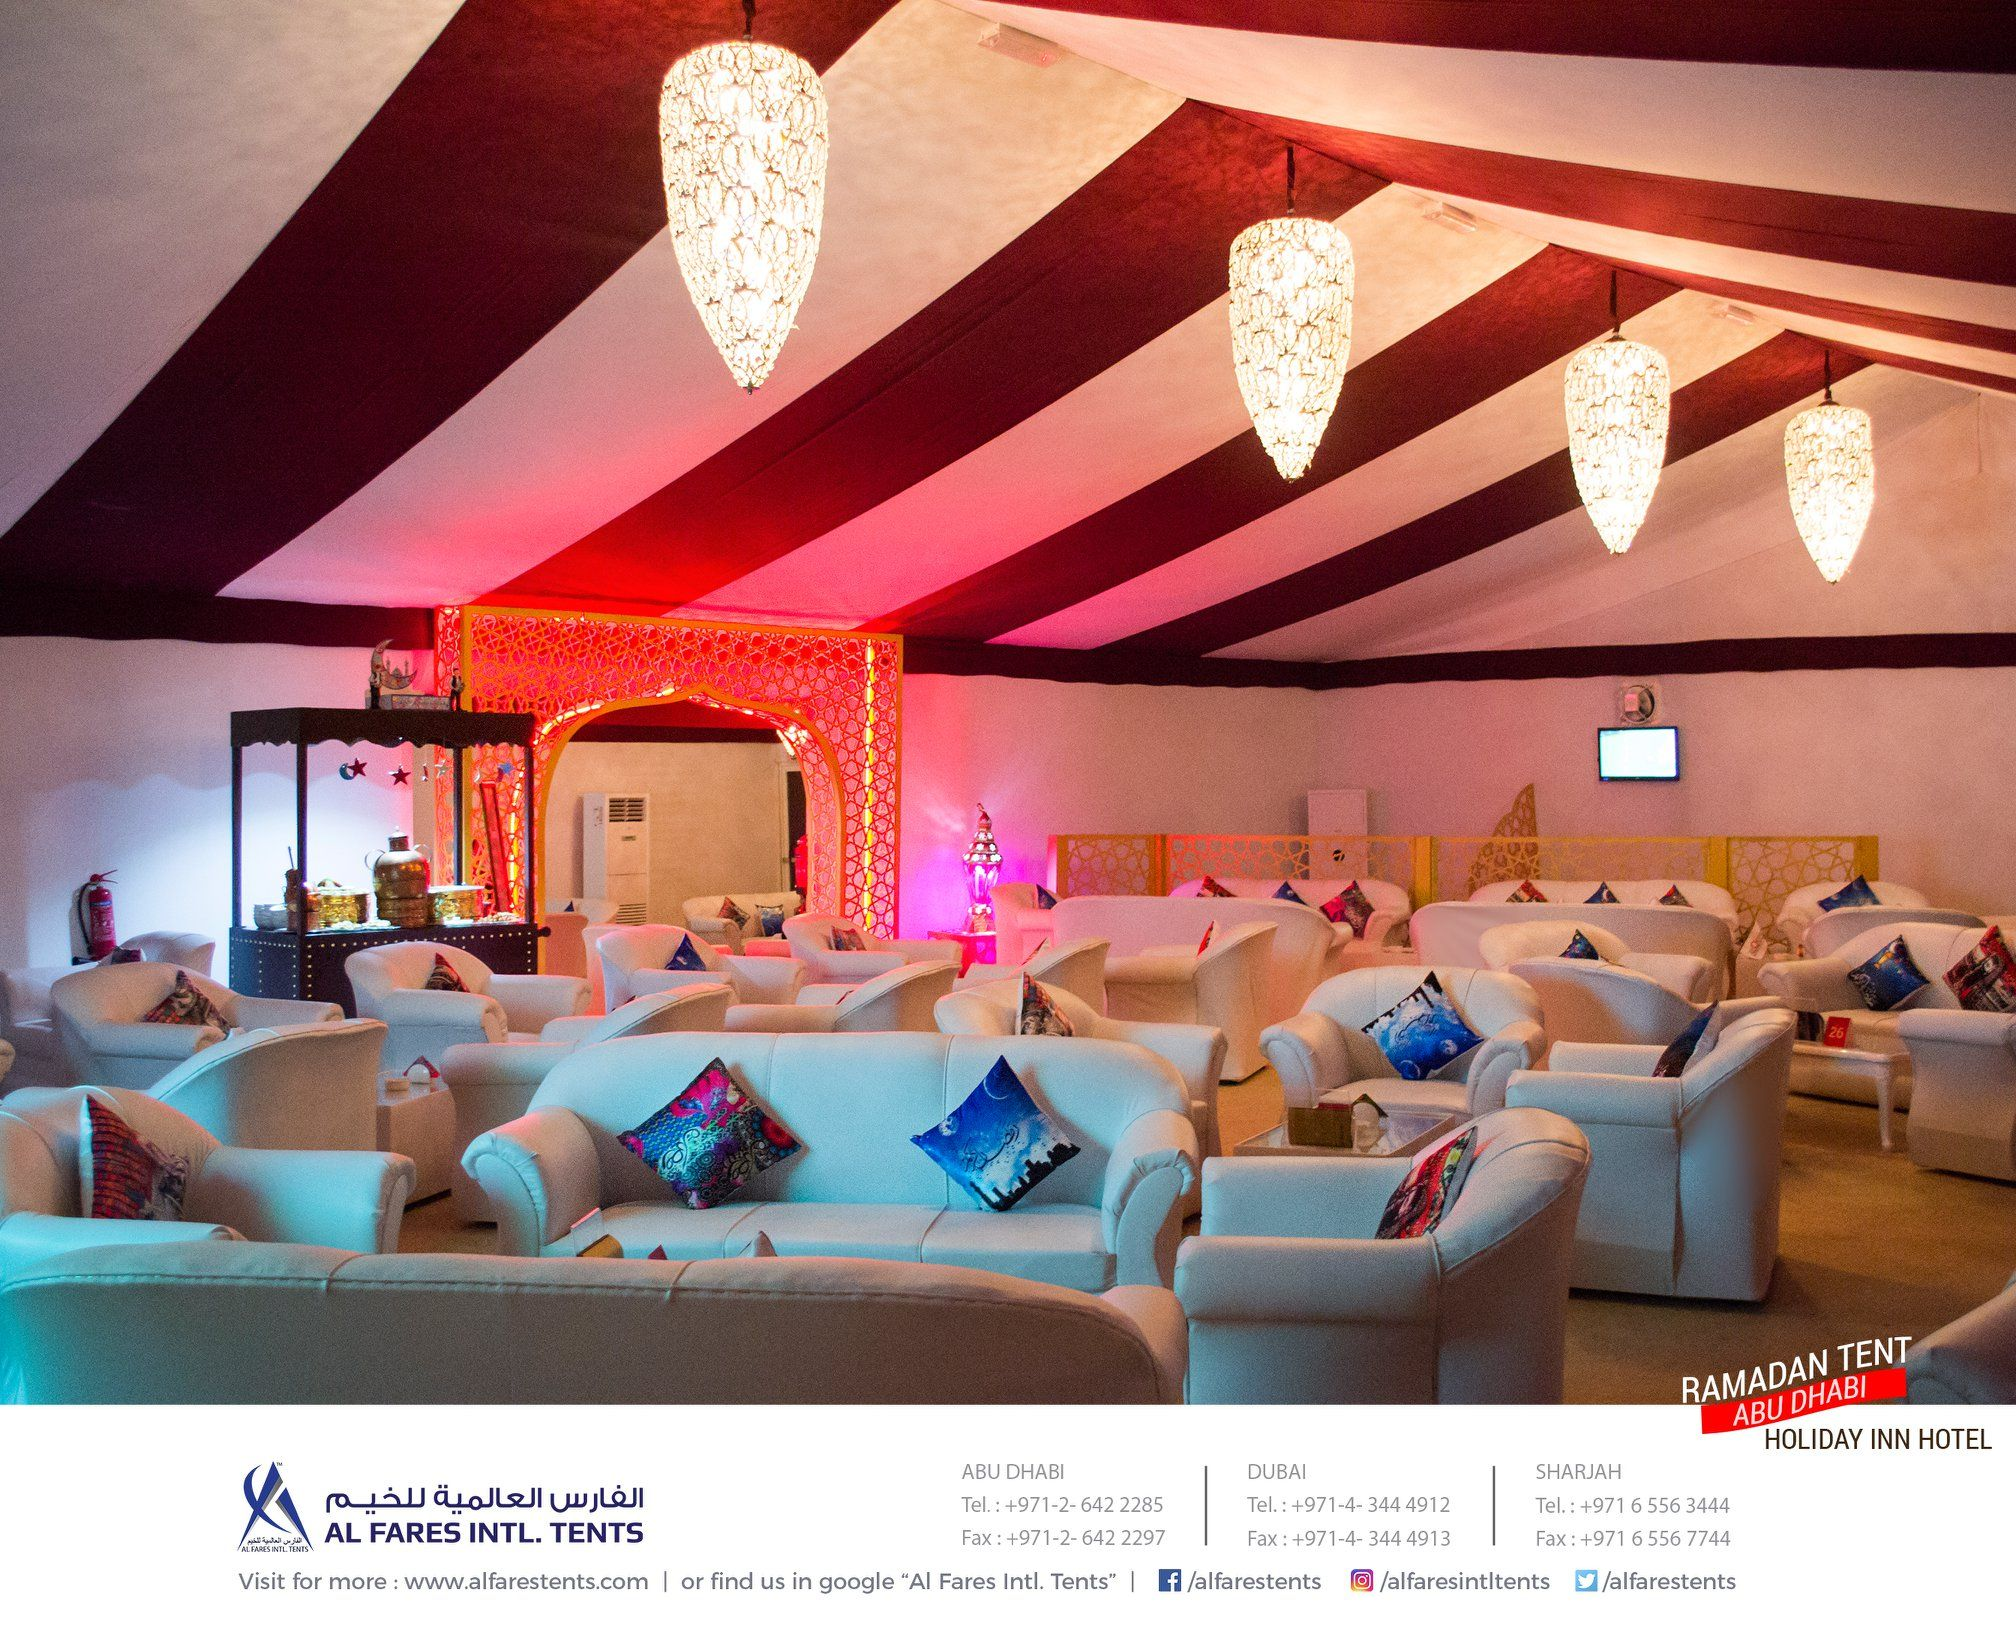 Rental Tent Suppliers in DUBAI | SHARJAH | ABU DHABI | Event